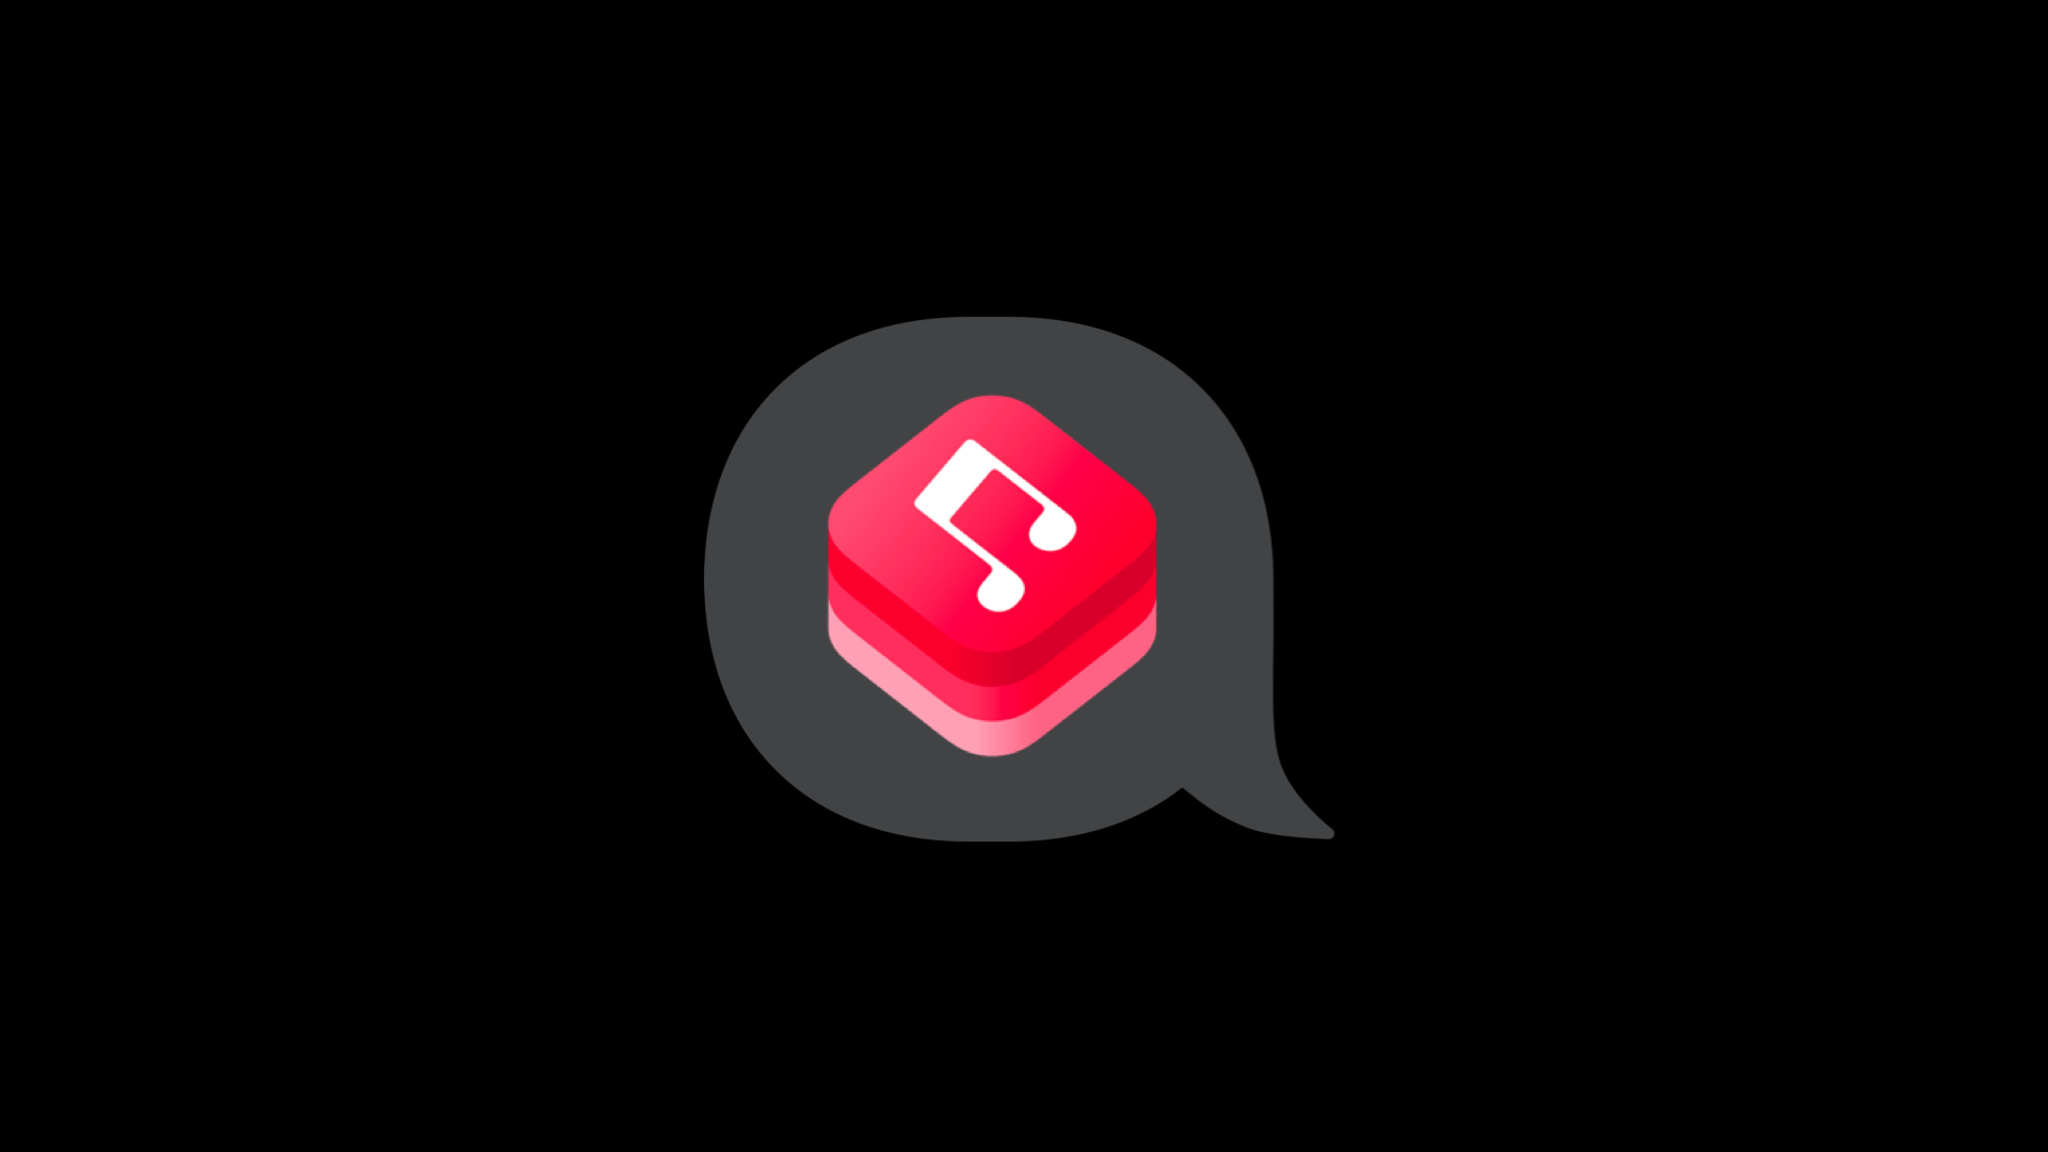 MusicKit icon inside of a speak bubble symbol